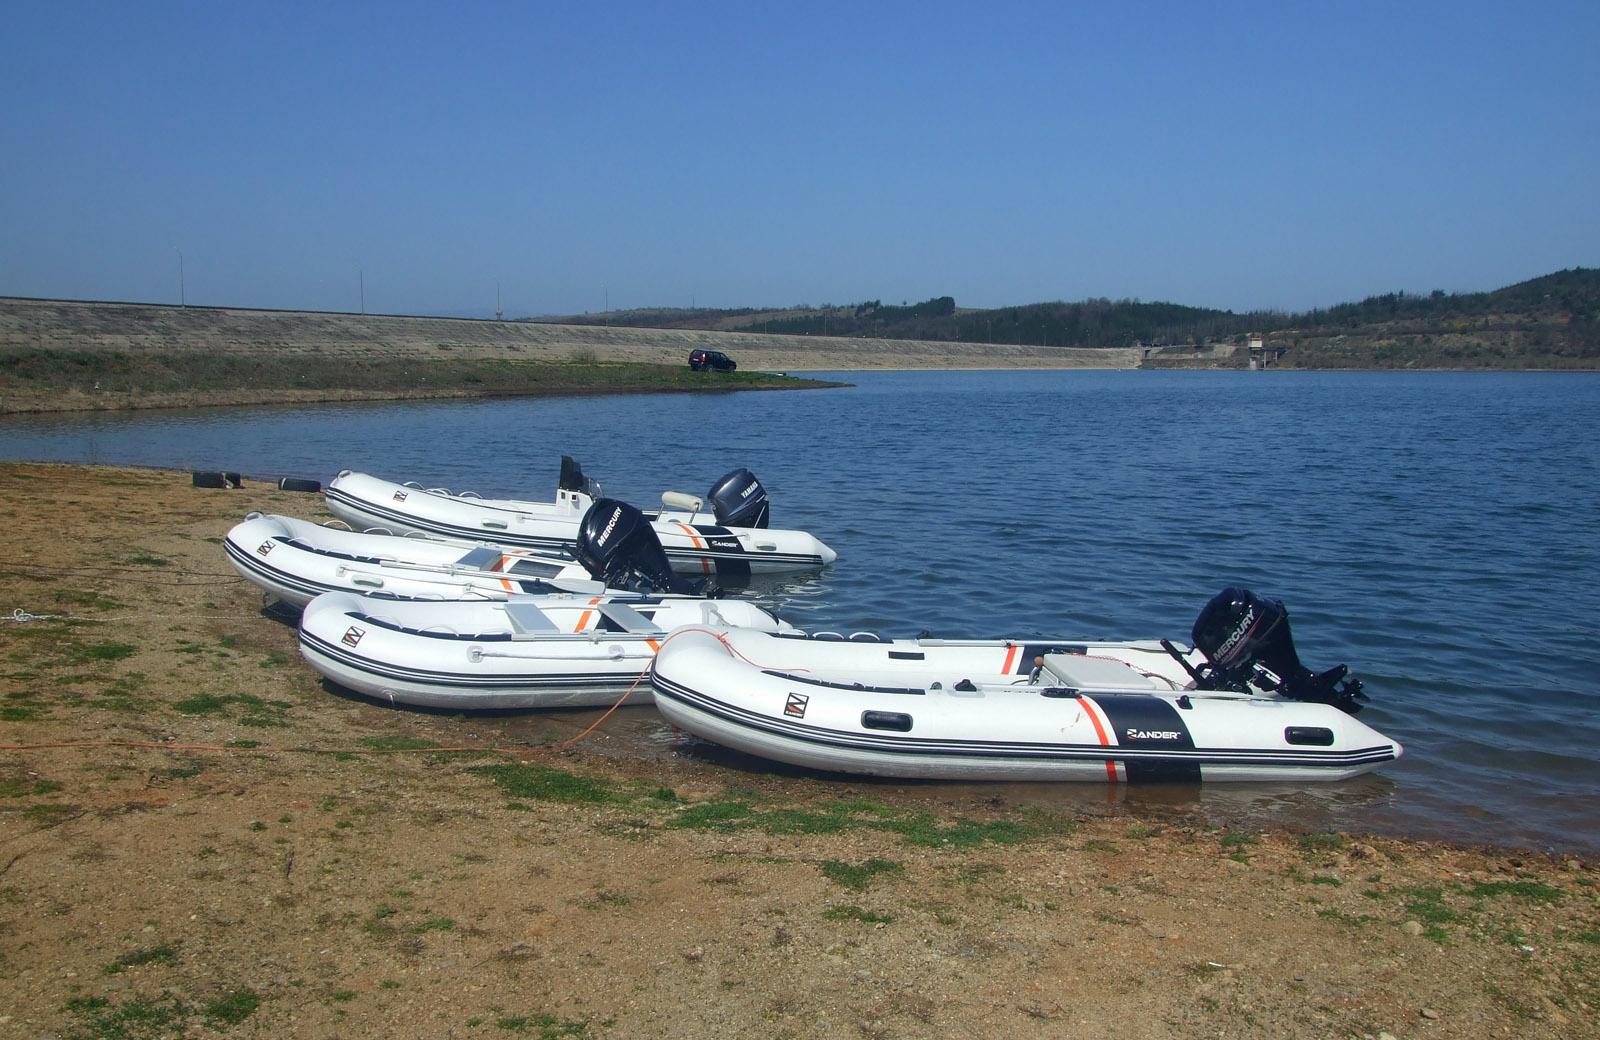 ZANDER надуваеми лодки, алуминиеви лодки и др. - Page 9 70ubtj